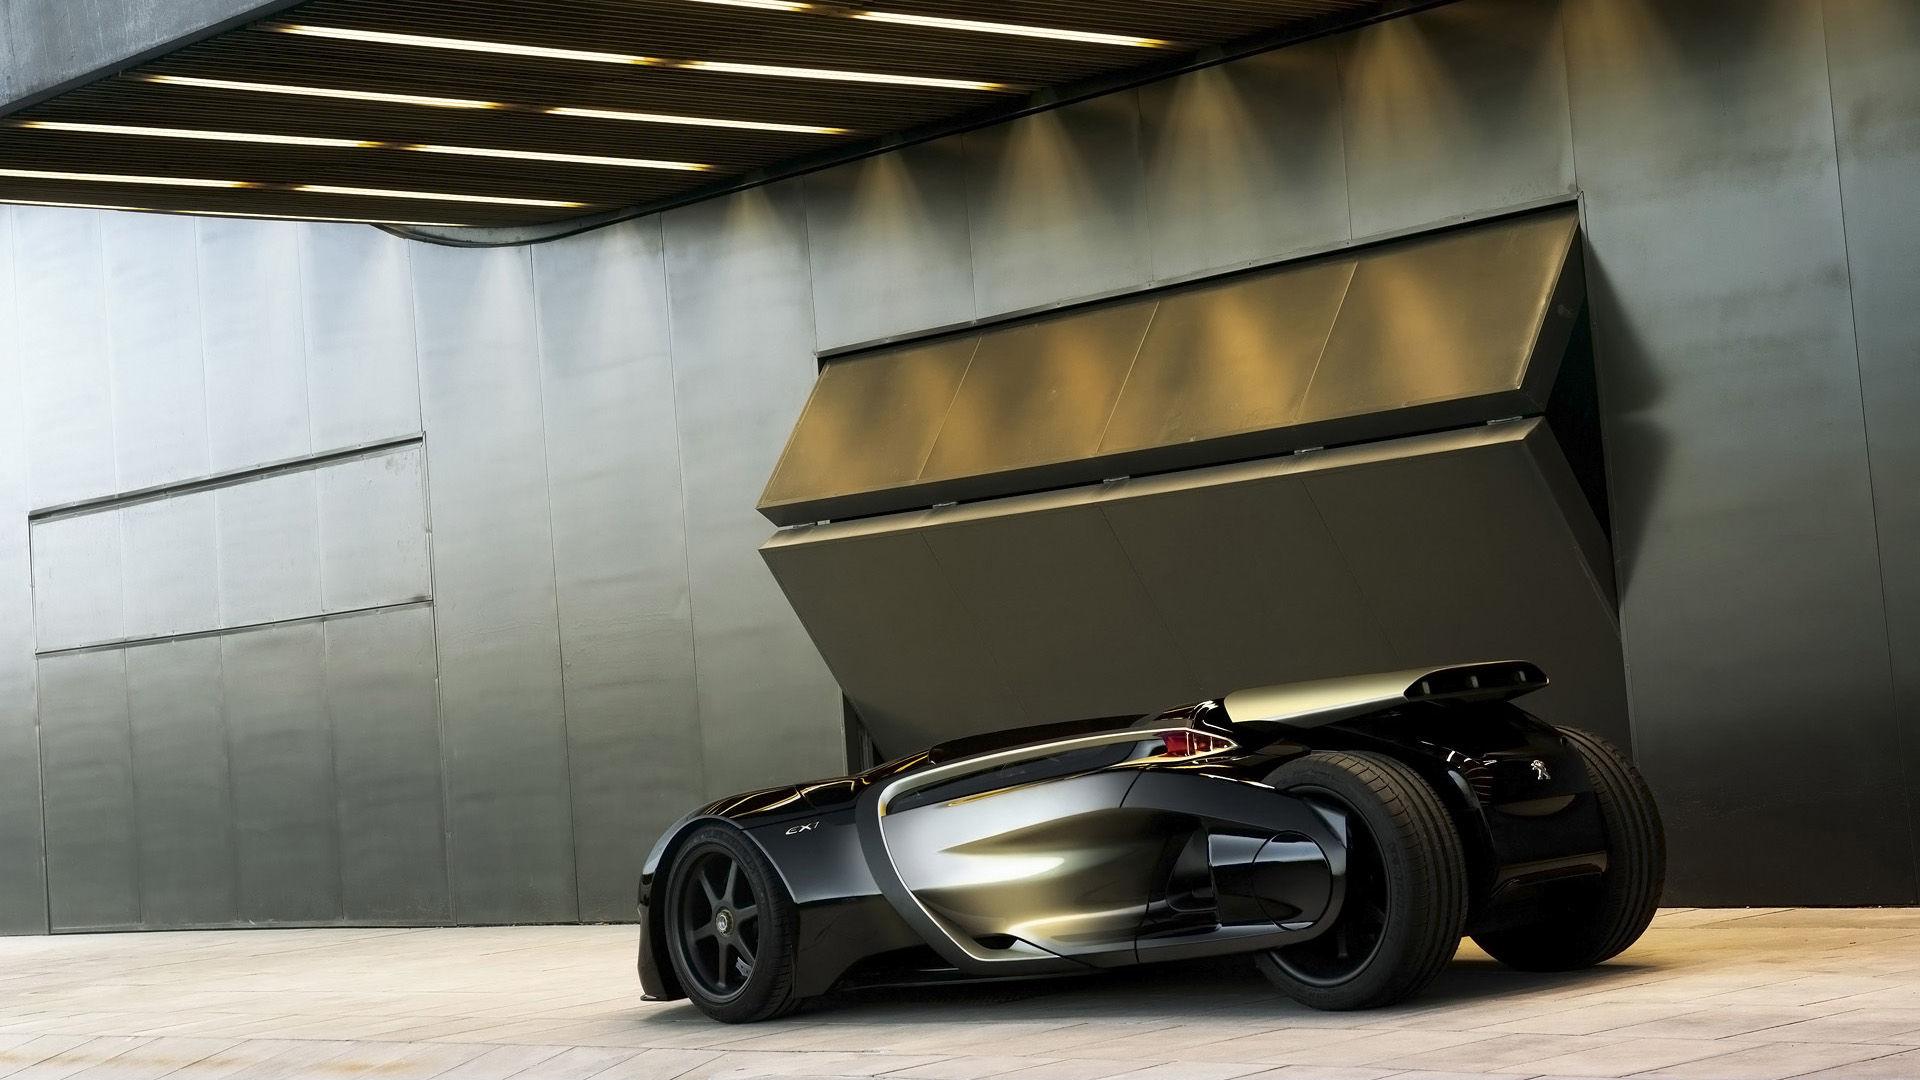 2010 Peugeot EX1 Concept